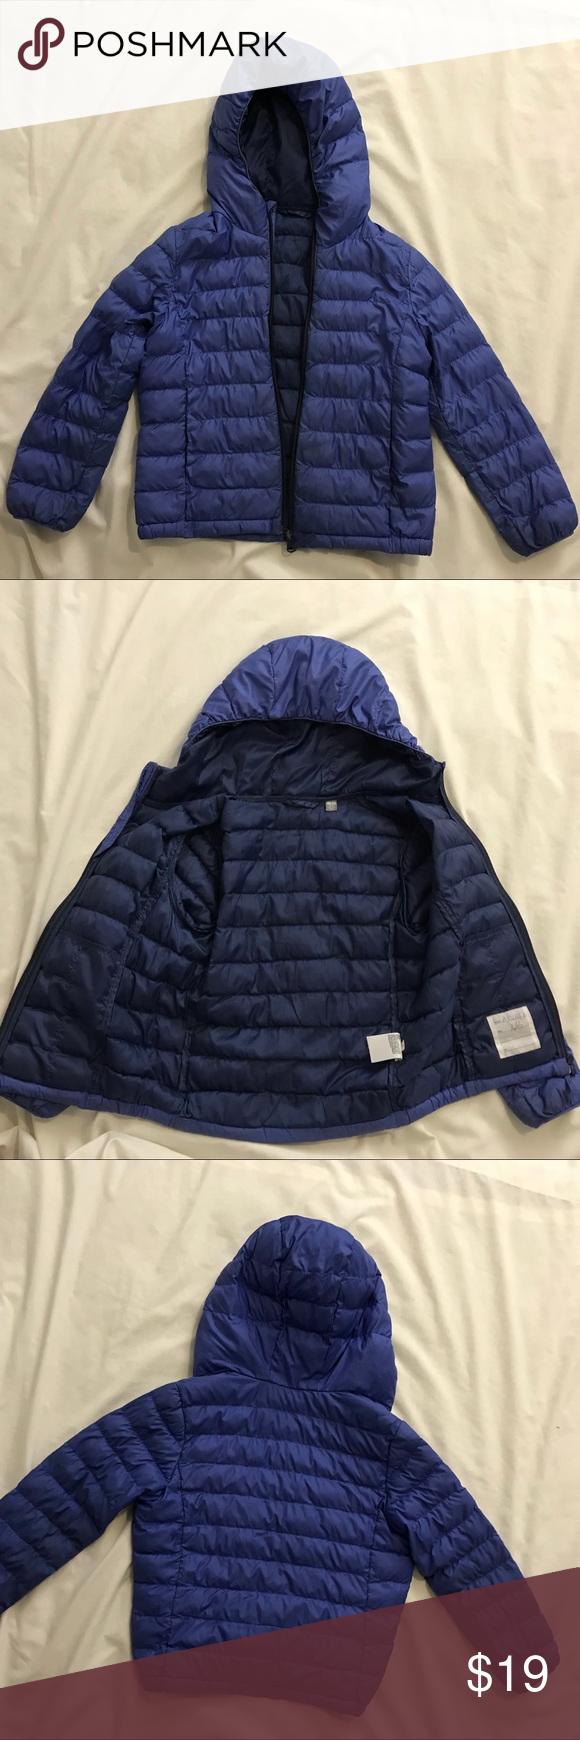 9590337c1 Uniqlo Kids boys lightweight blue puffer jacket Uniqlo kids boys ...